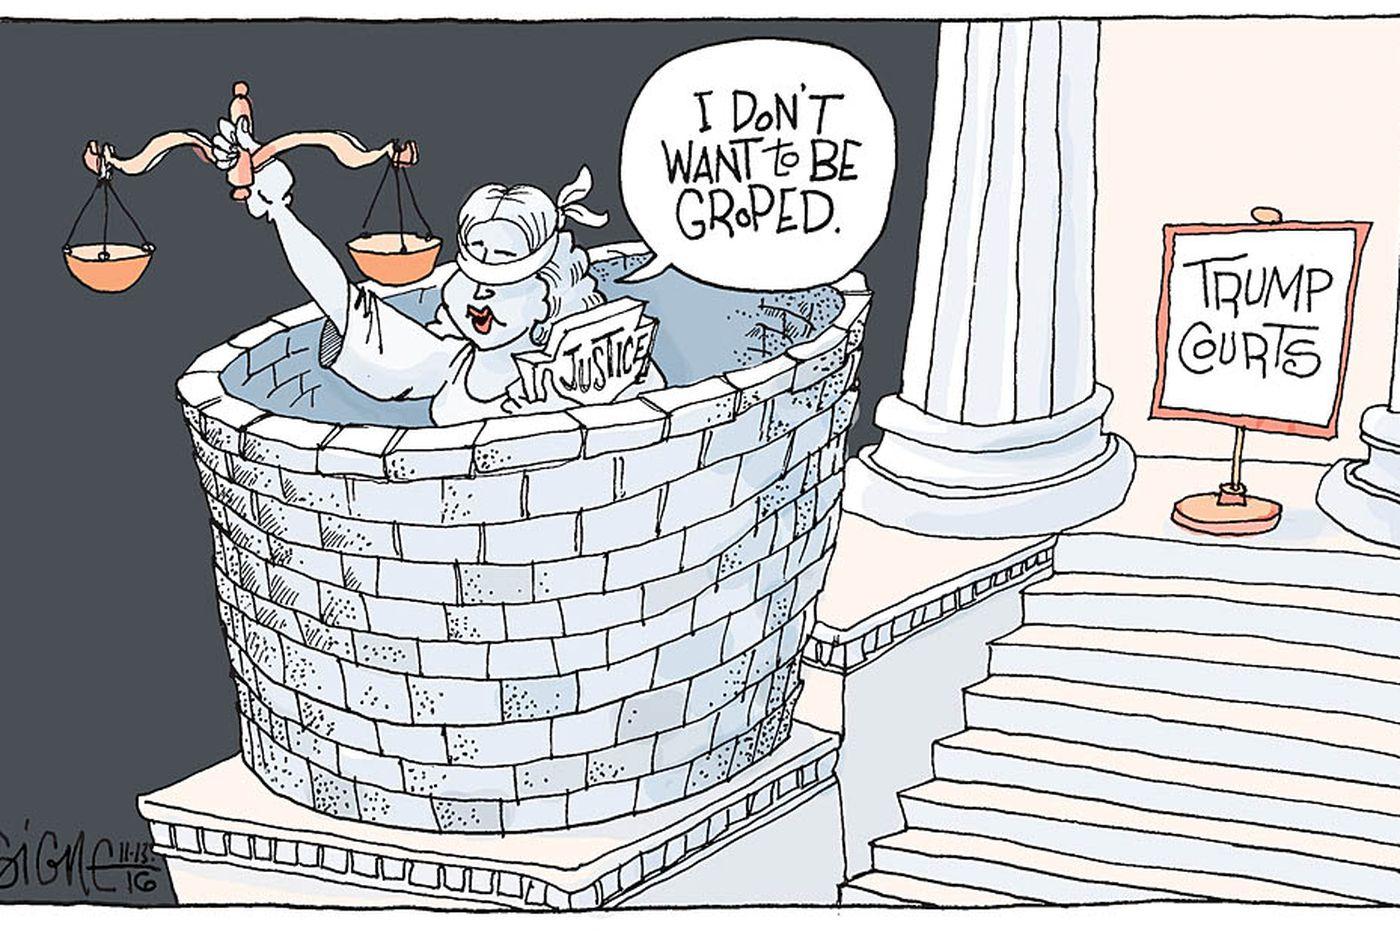 Daily Signe Cartoon 11/13/16